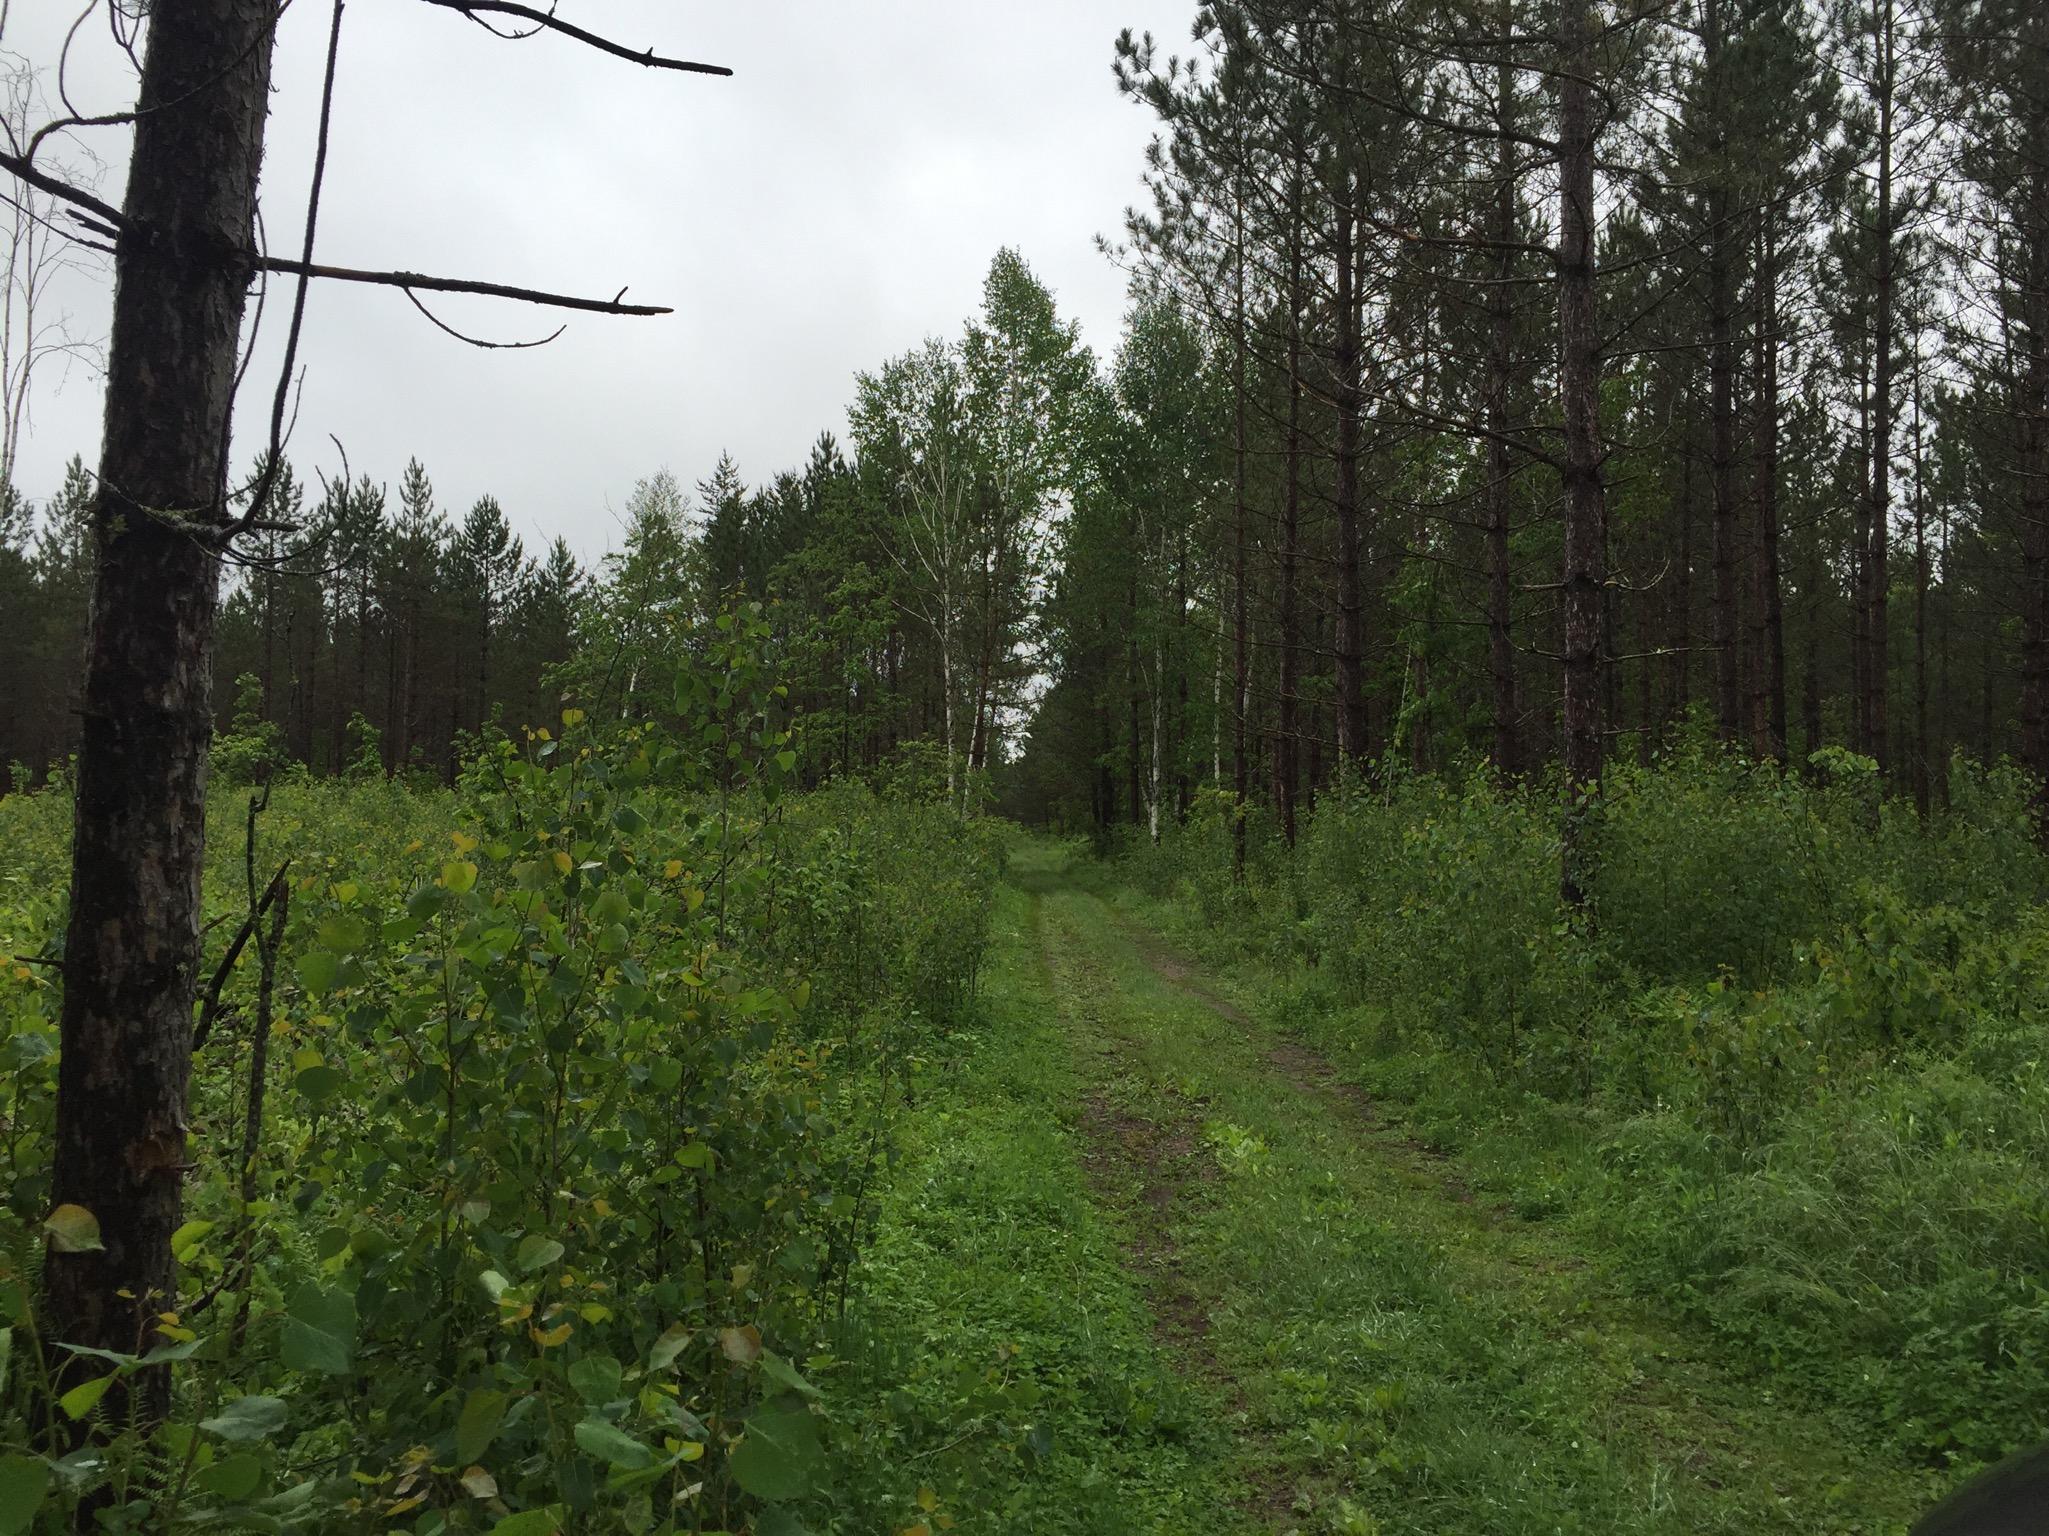 NESW Forest Rd 3845 NE, Moose Lake Twp, Pennington